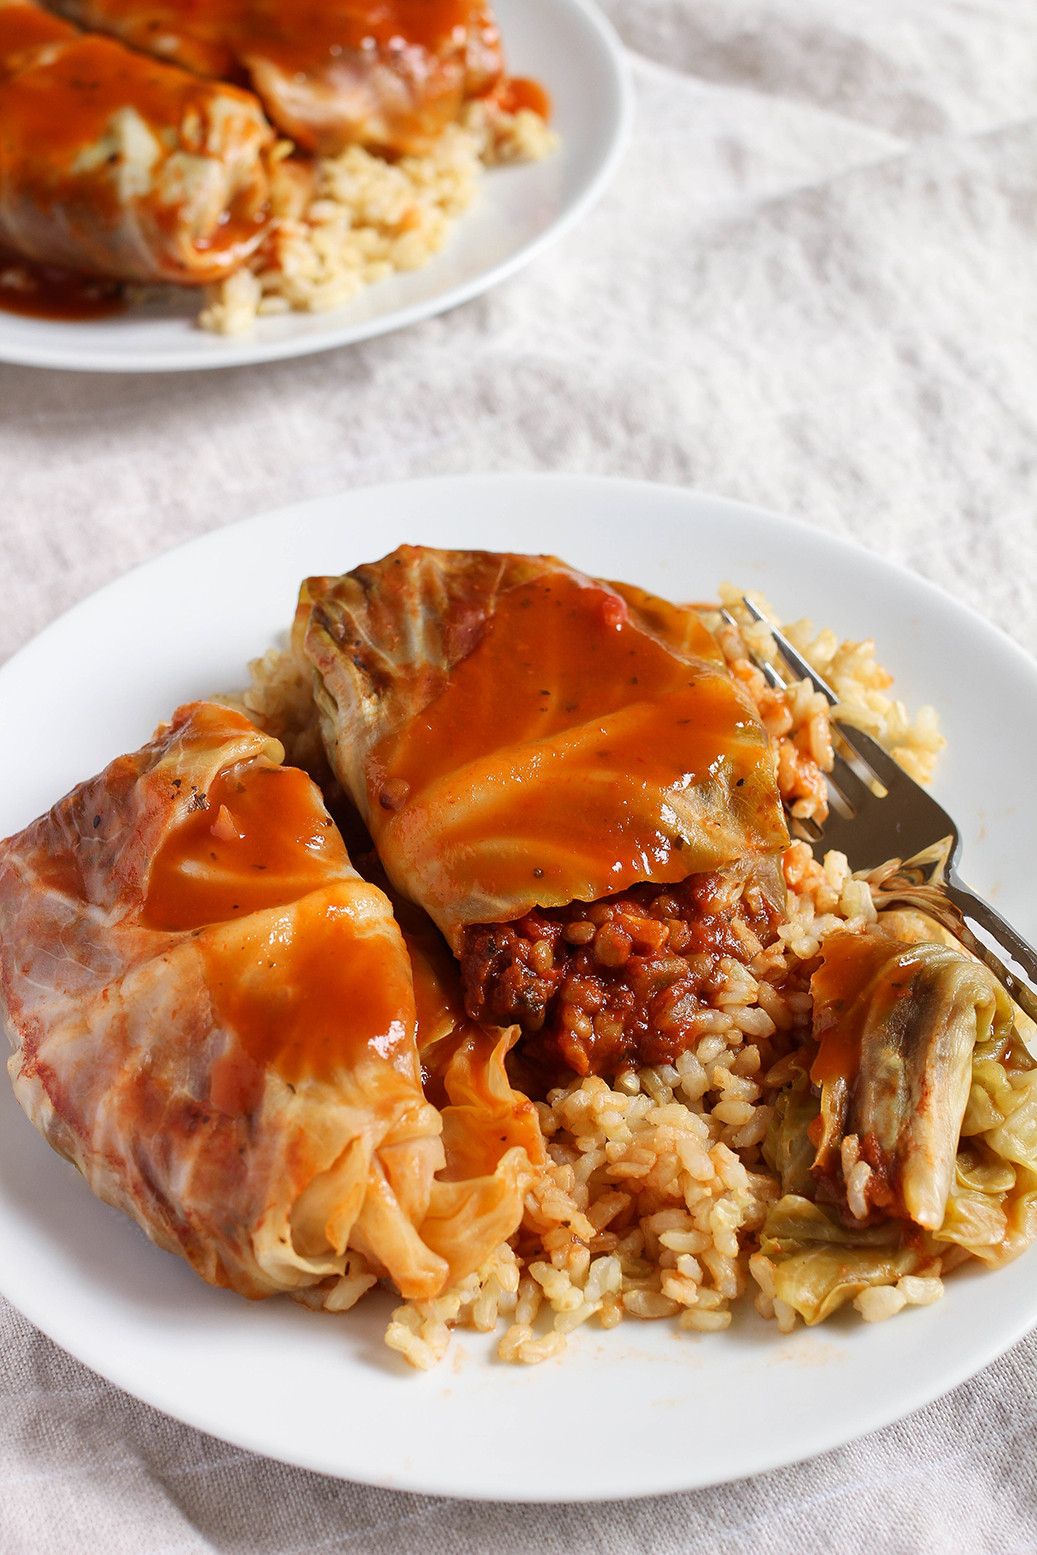 Vegan Stuffed Cabbage  Lentil Bolognese Stuffed Cabbage Rolls